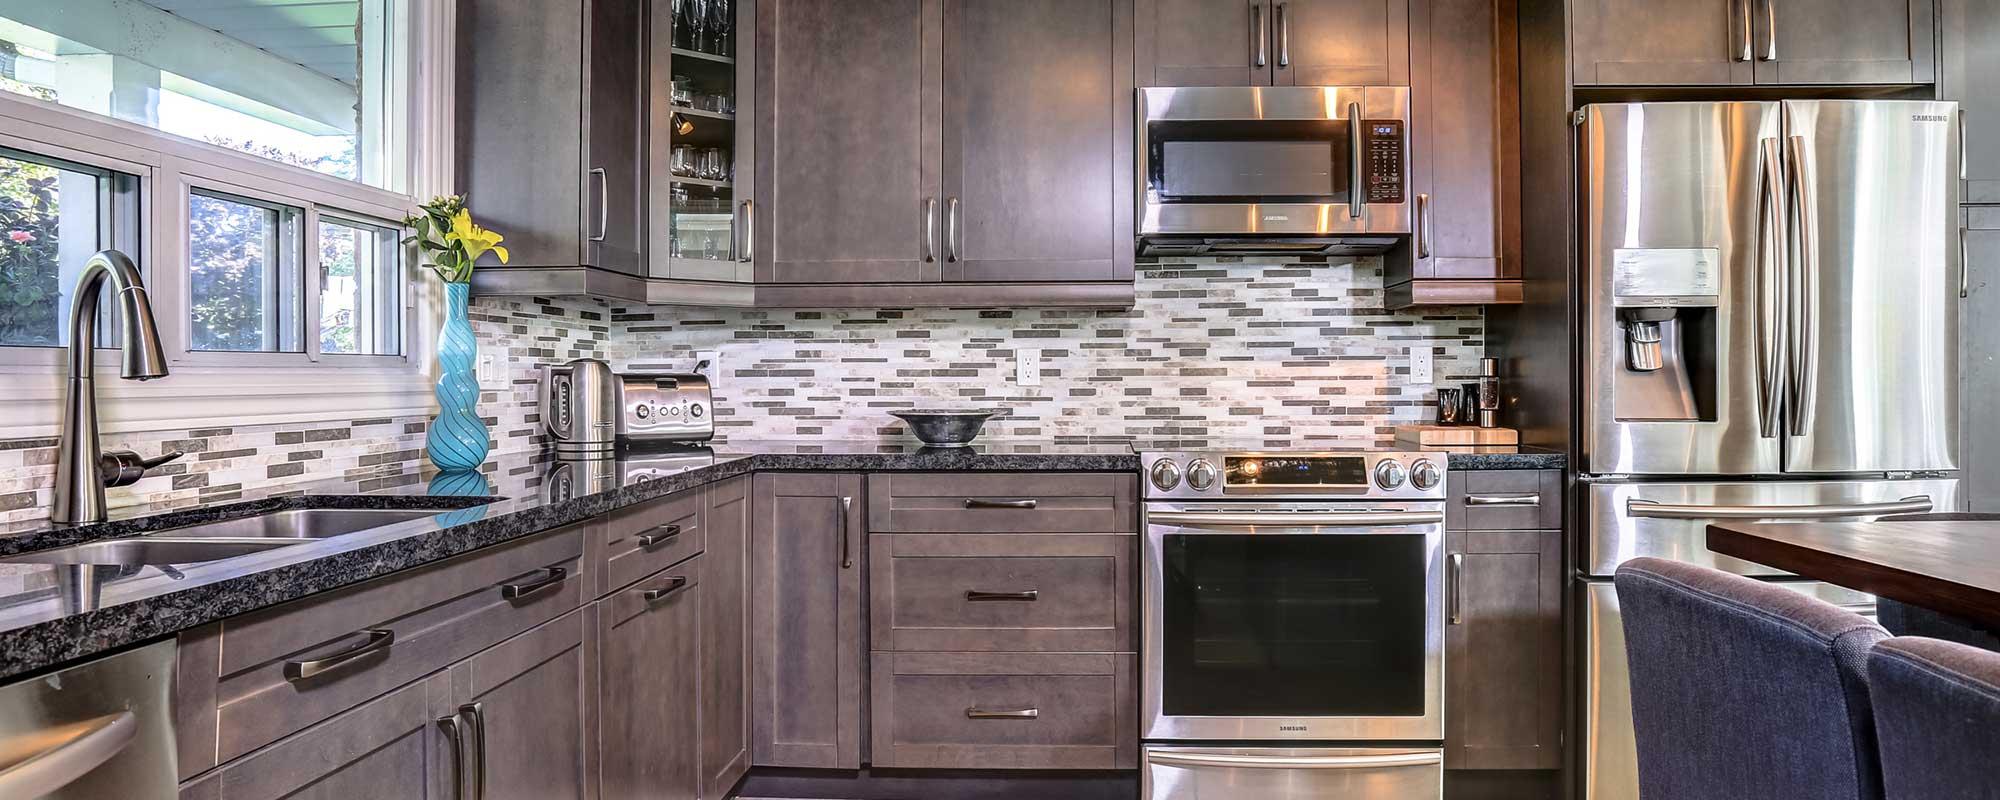 Haviland Drive Kitchen Renovation